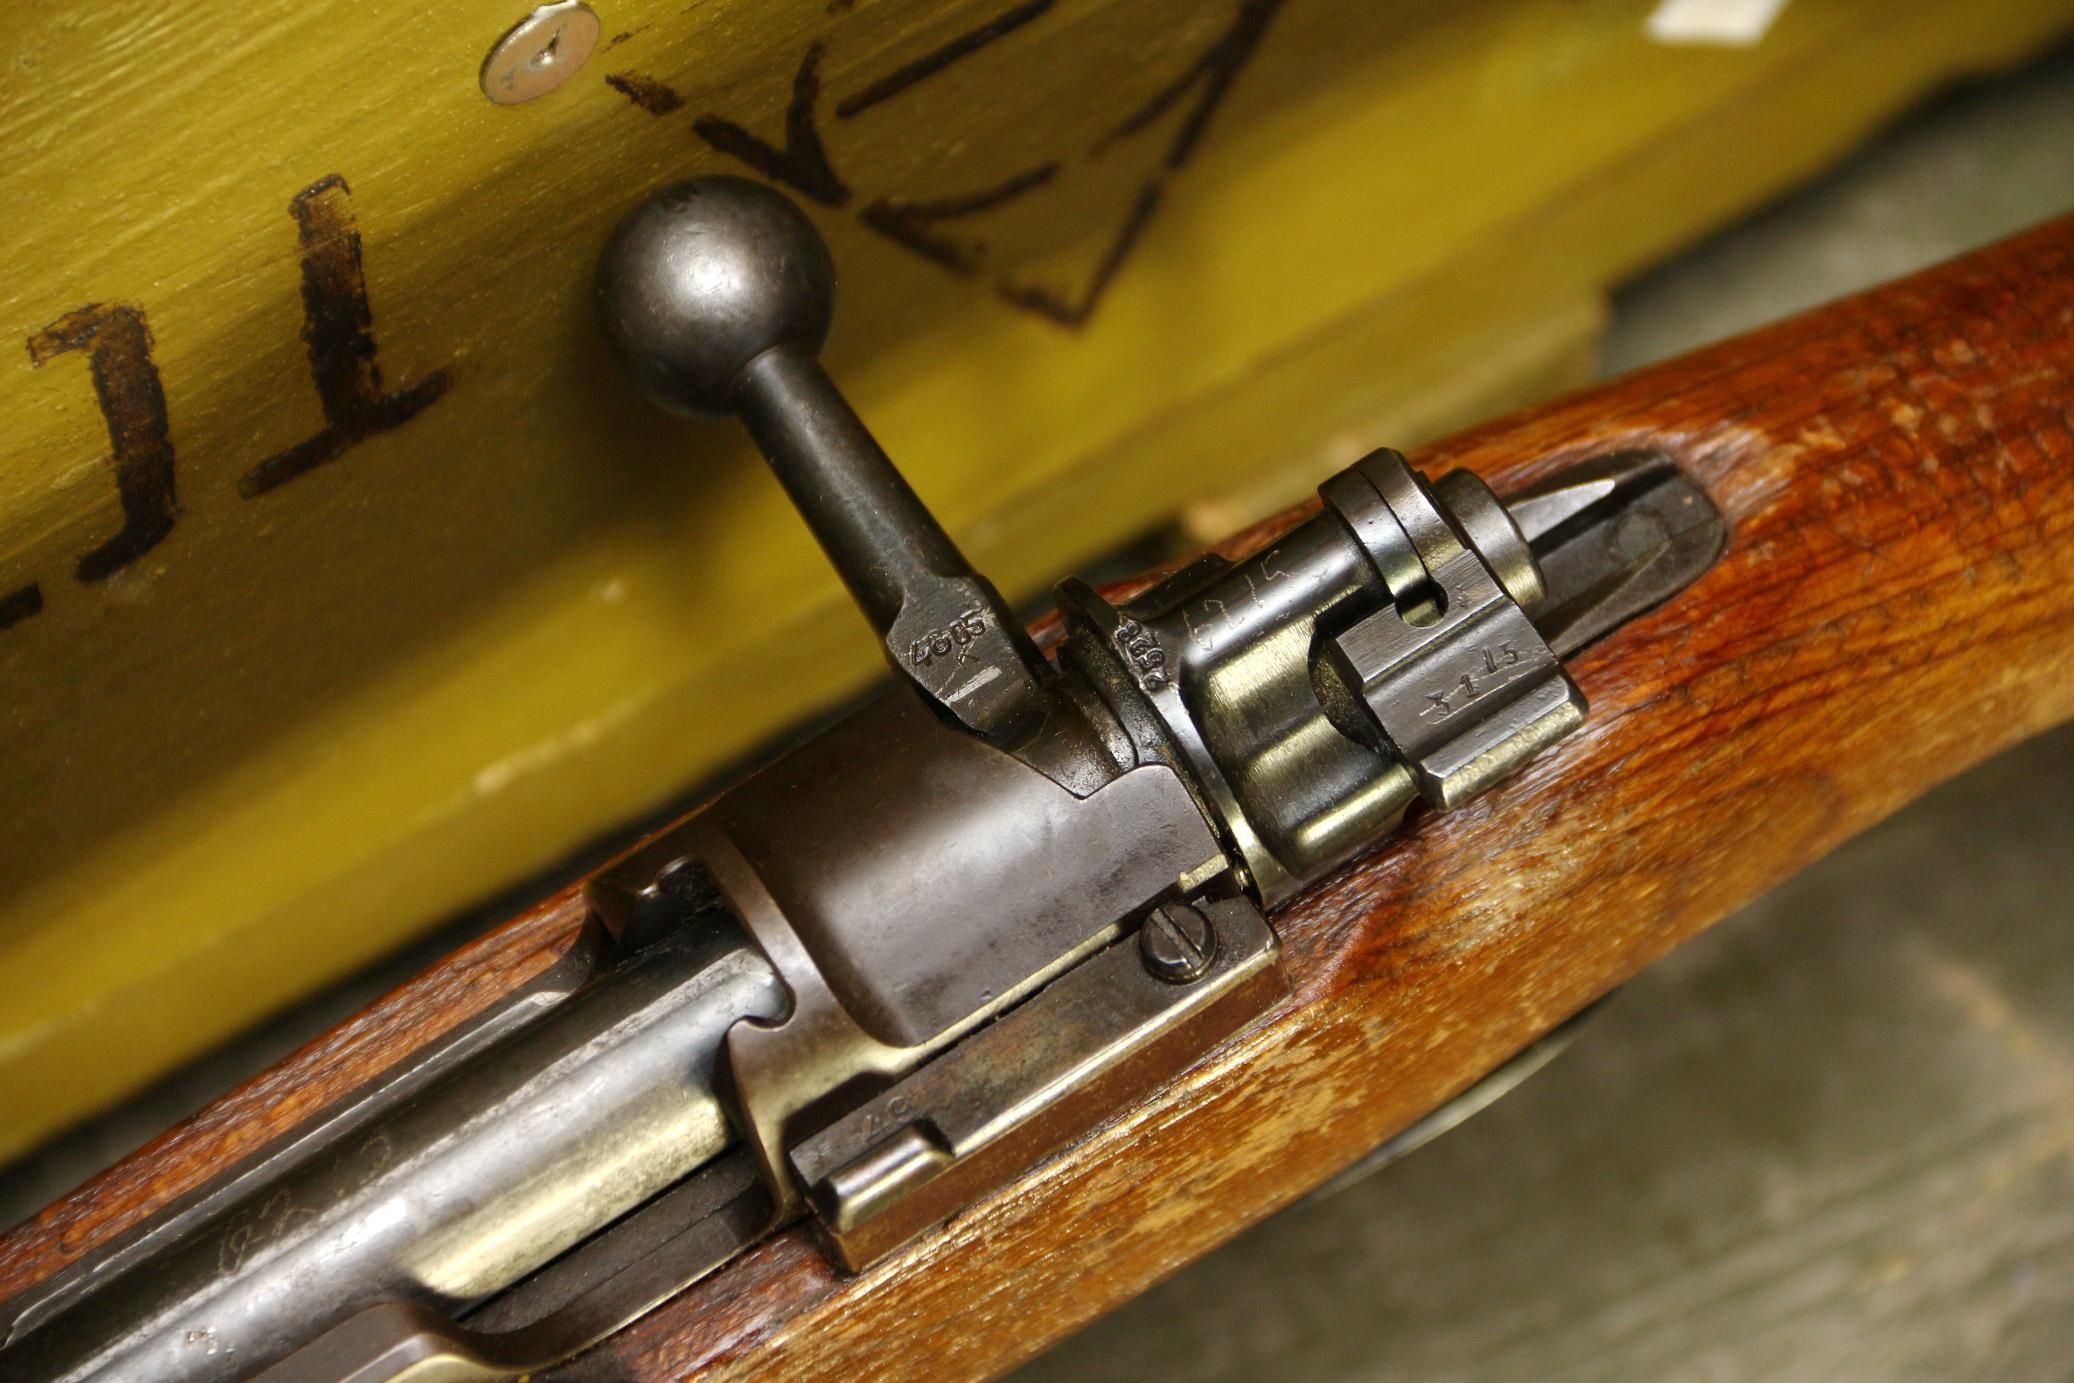 Mauser K98, 1937 год, №6215, завод S/147 S/147 J.P. Sauer & Sohn, Suhl